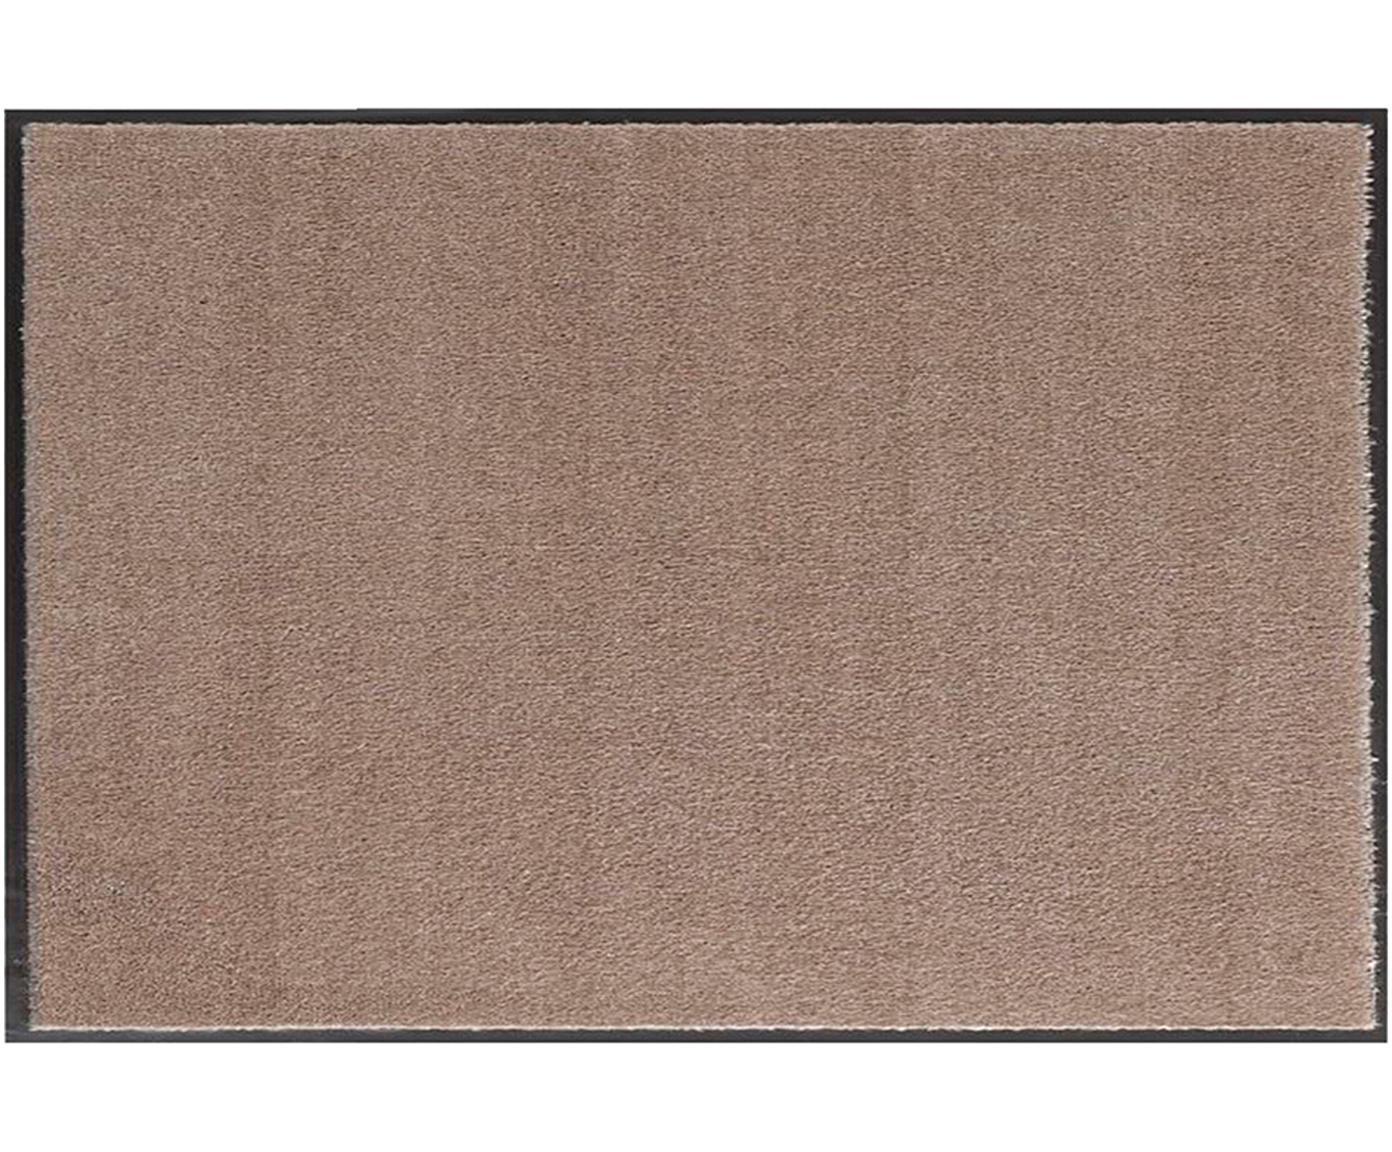 Polyamide deurmat Milo, Bovenzijde: polyamide, Onderzijde: rubber, Taupe, zwart, 39 x 58 cm